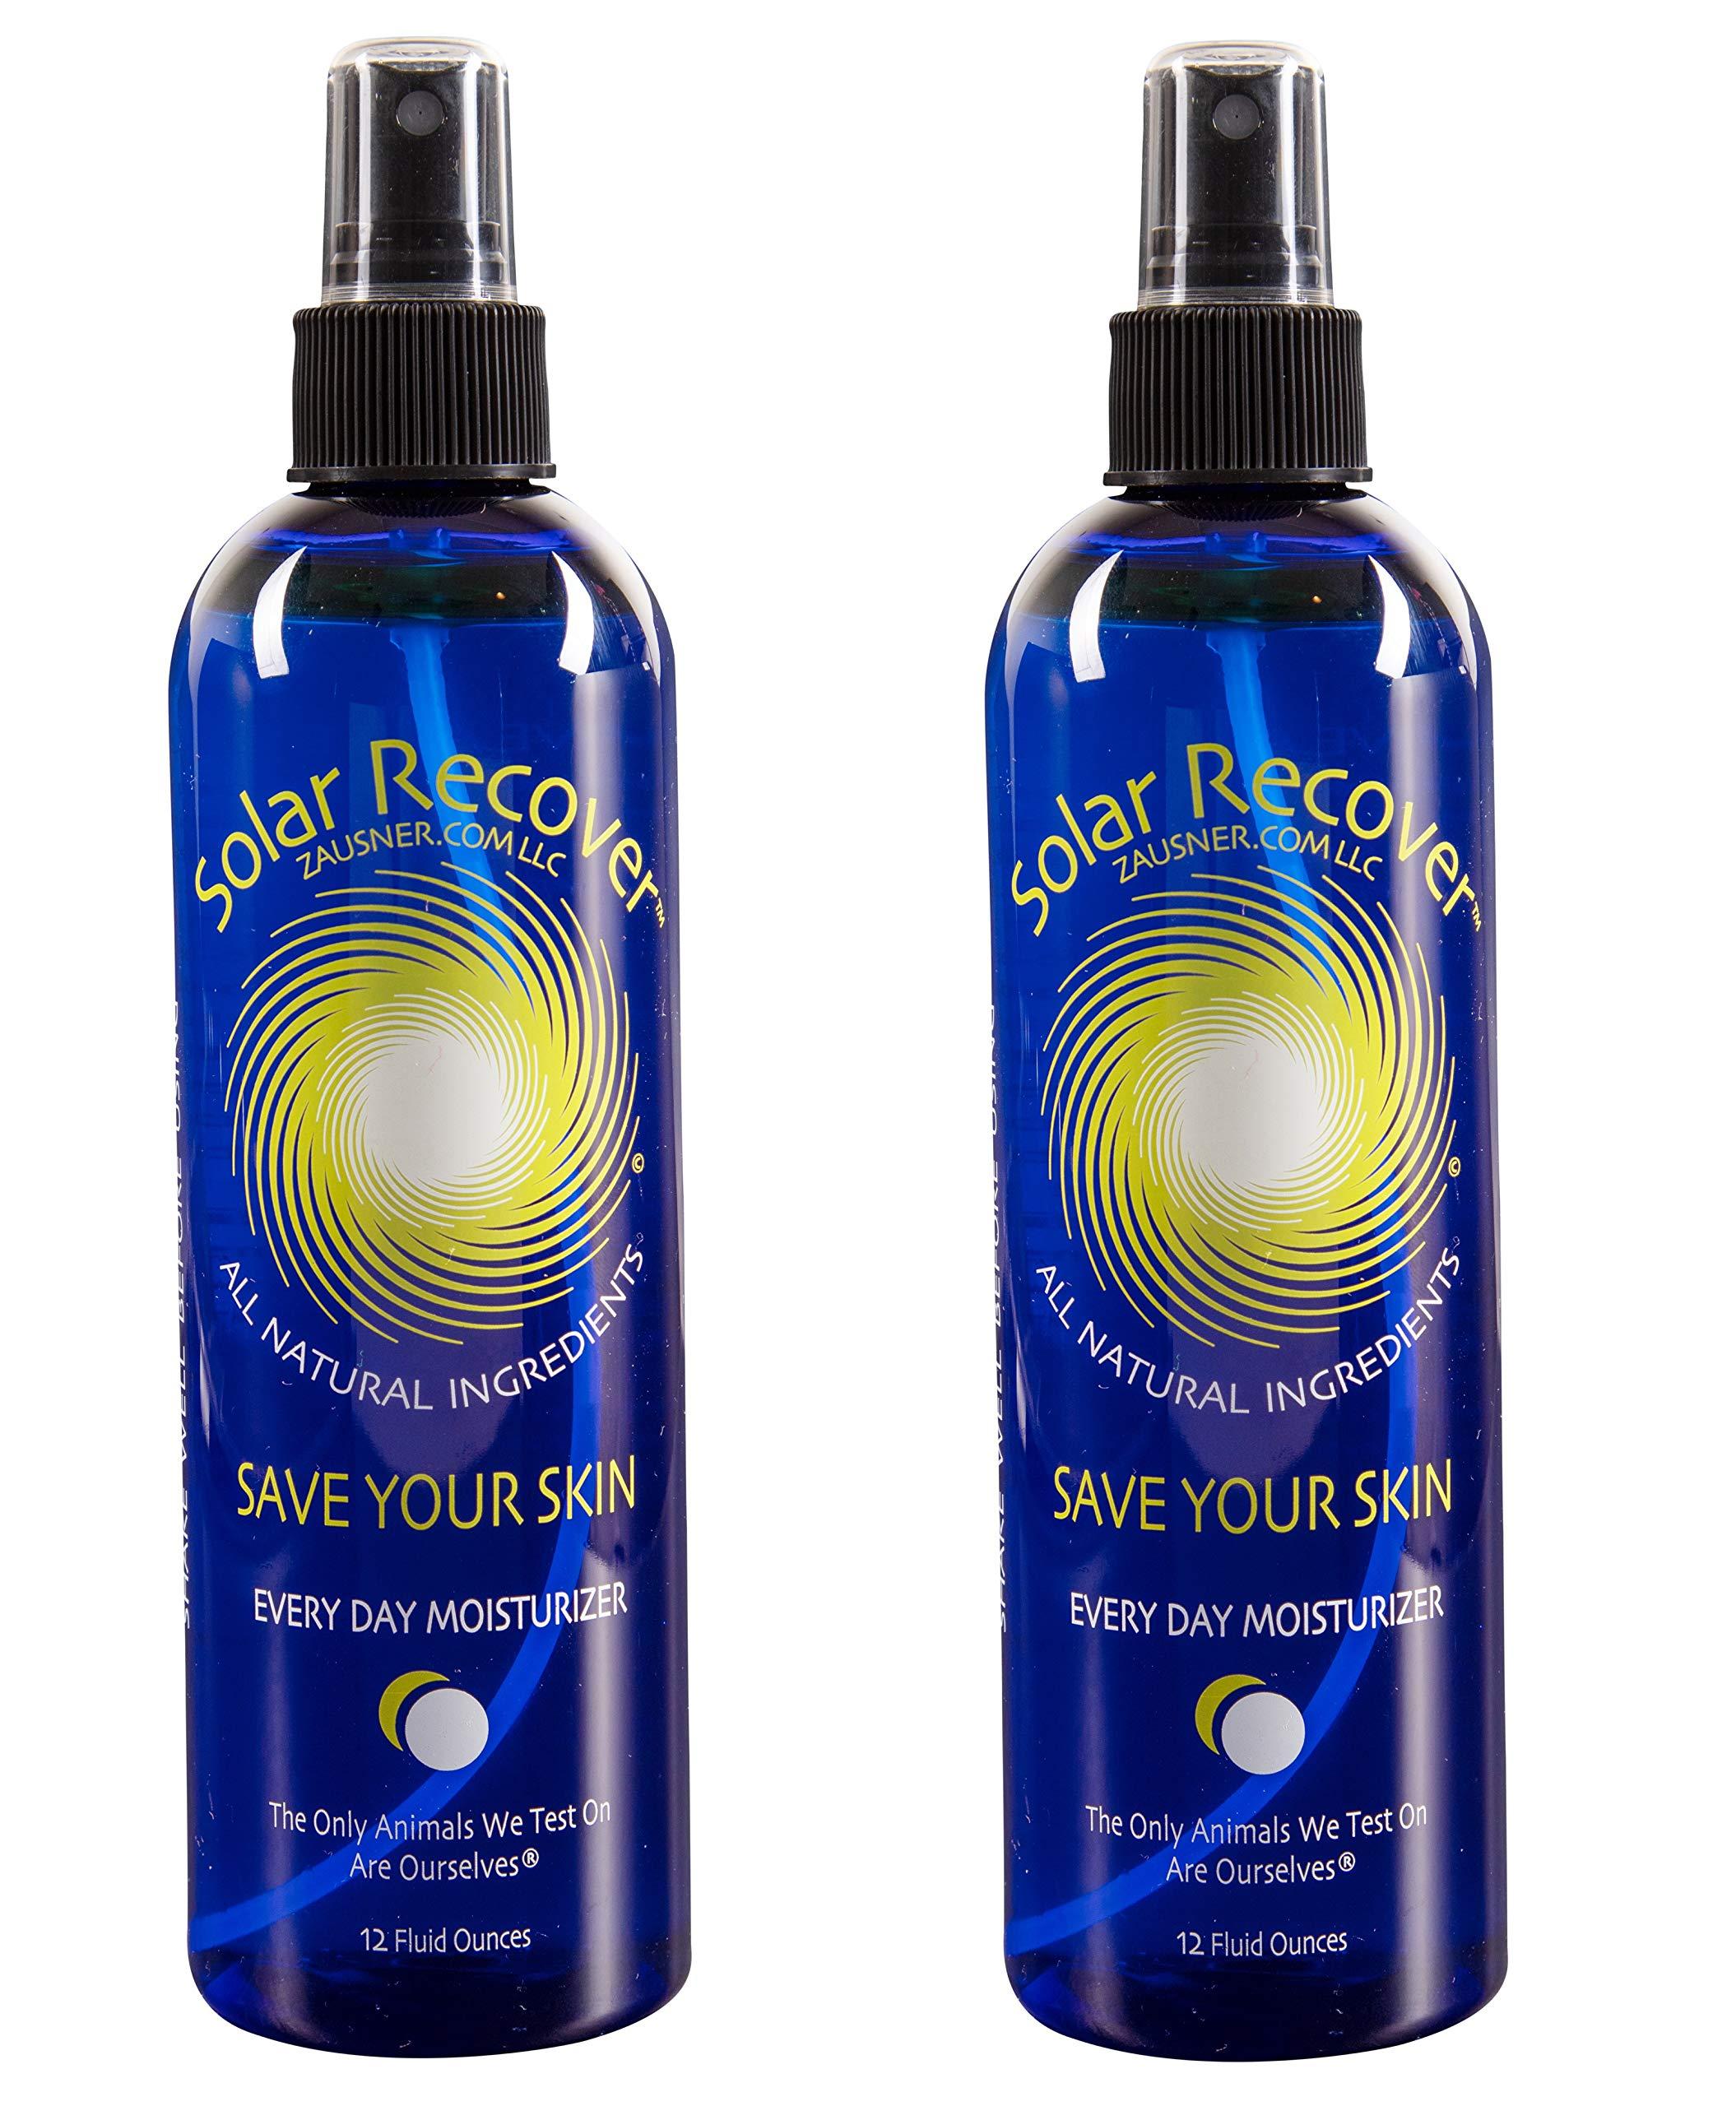 Solar Recover - After Sun Moisturizing Spray 2 Pack - (24 Ounces) - Hydrating Facial and Body Mist - 4920 Sprays of Sunburn Relief With Vitamin E and Calendula